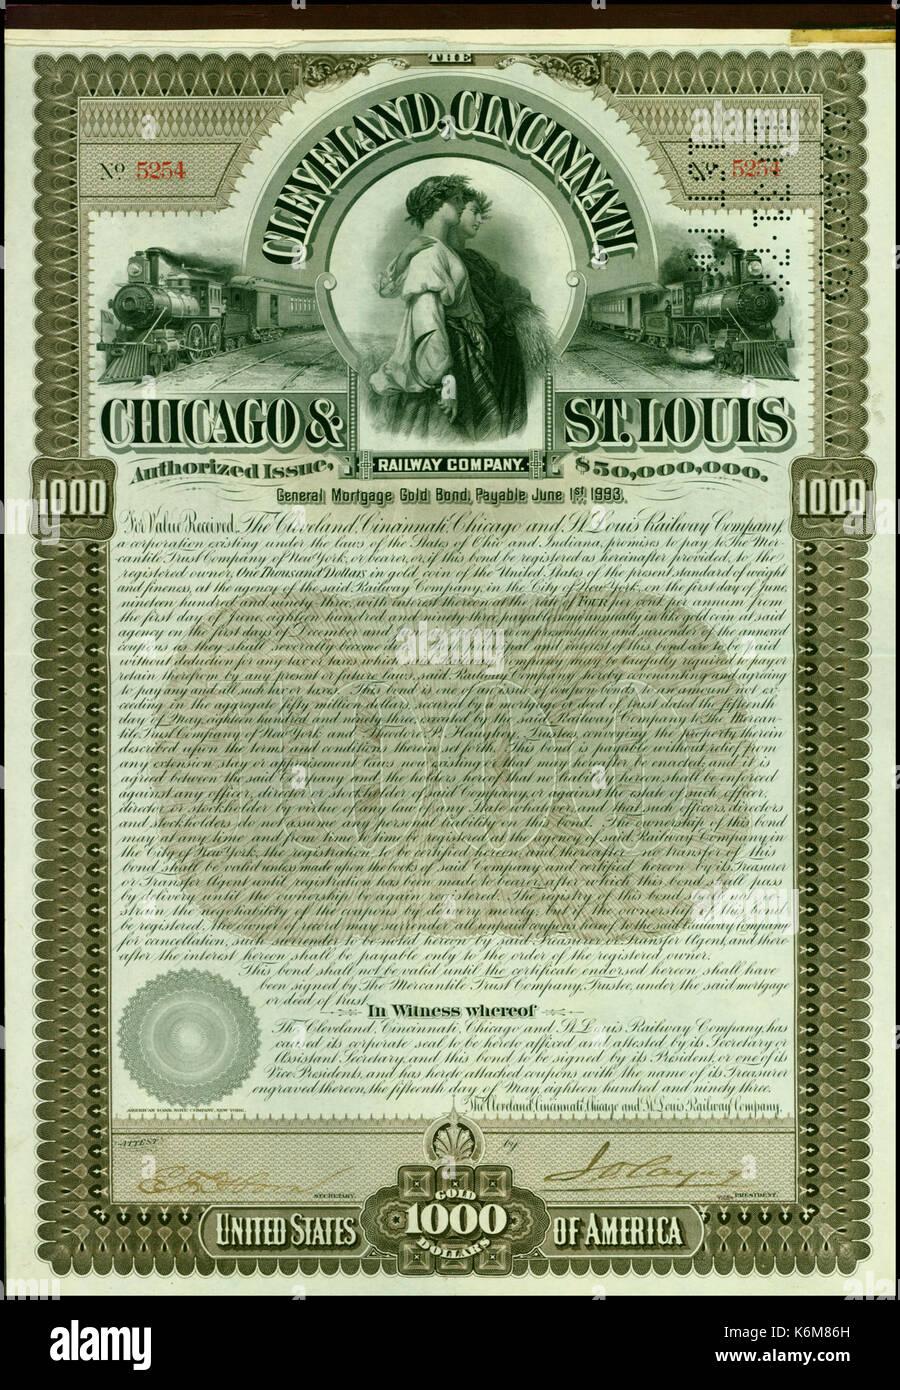 Cleveland, Cincinnati, Chicago & St. Louis RW 1893 - Stock Image